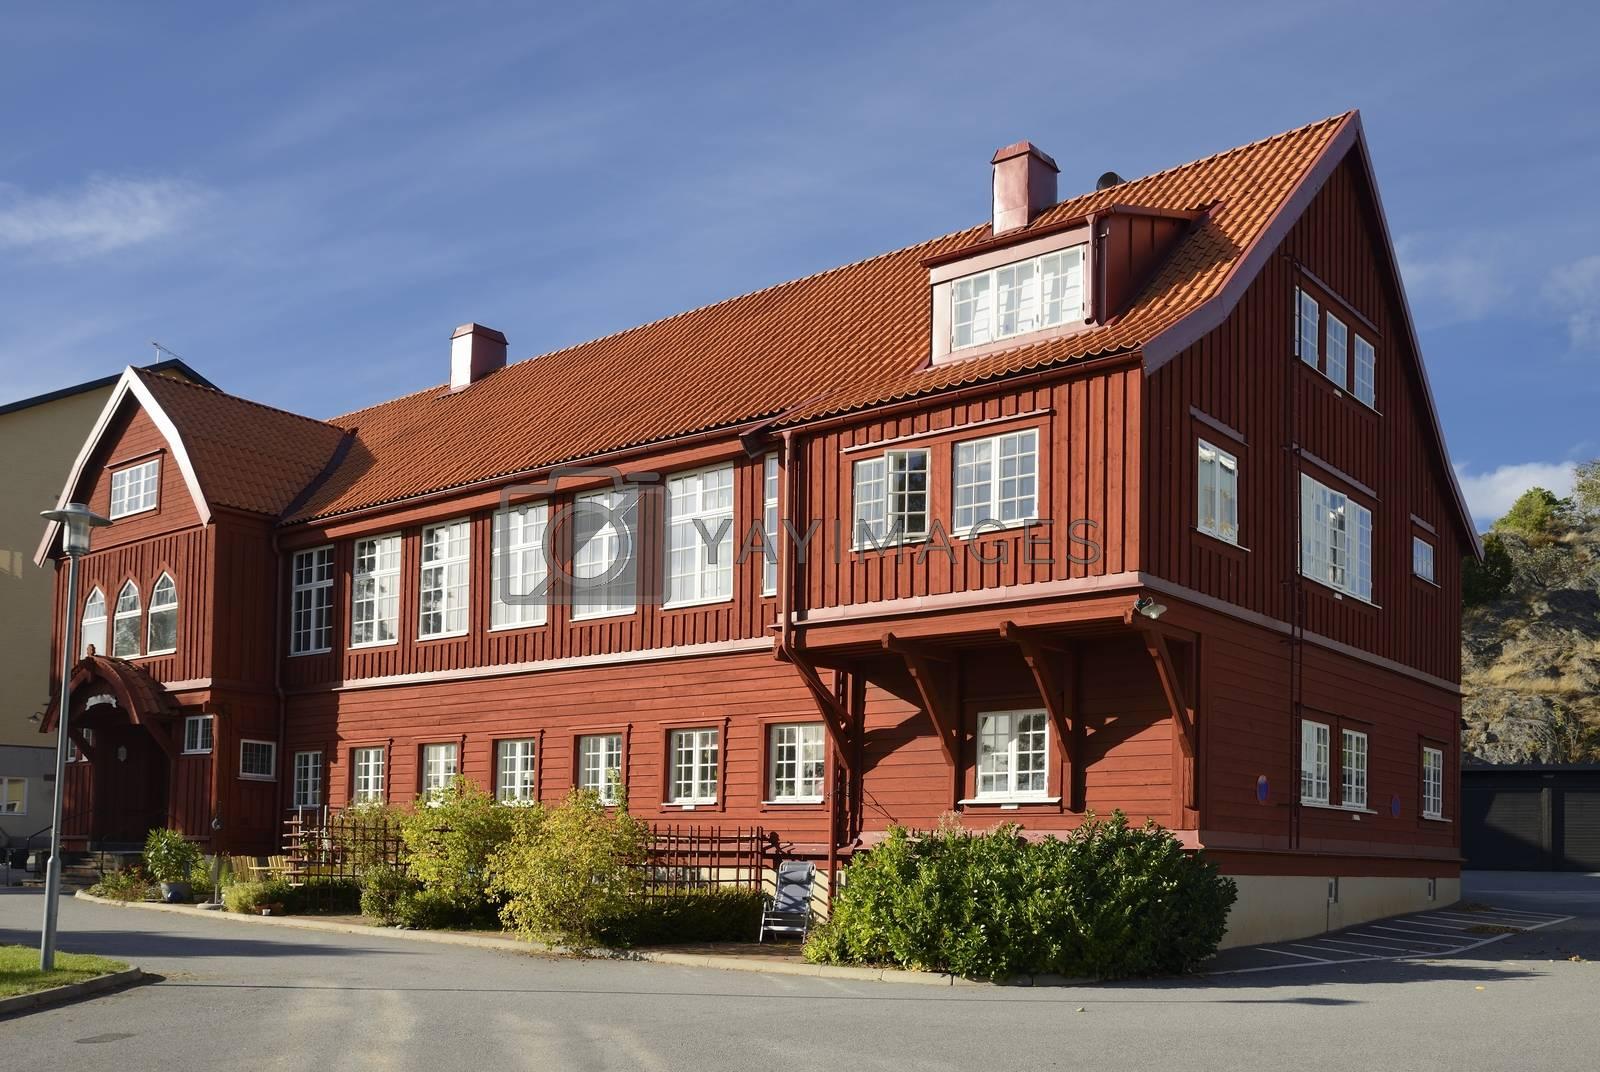 Old Swedish house in Nynäshamn - Sweden.